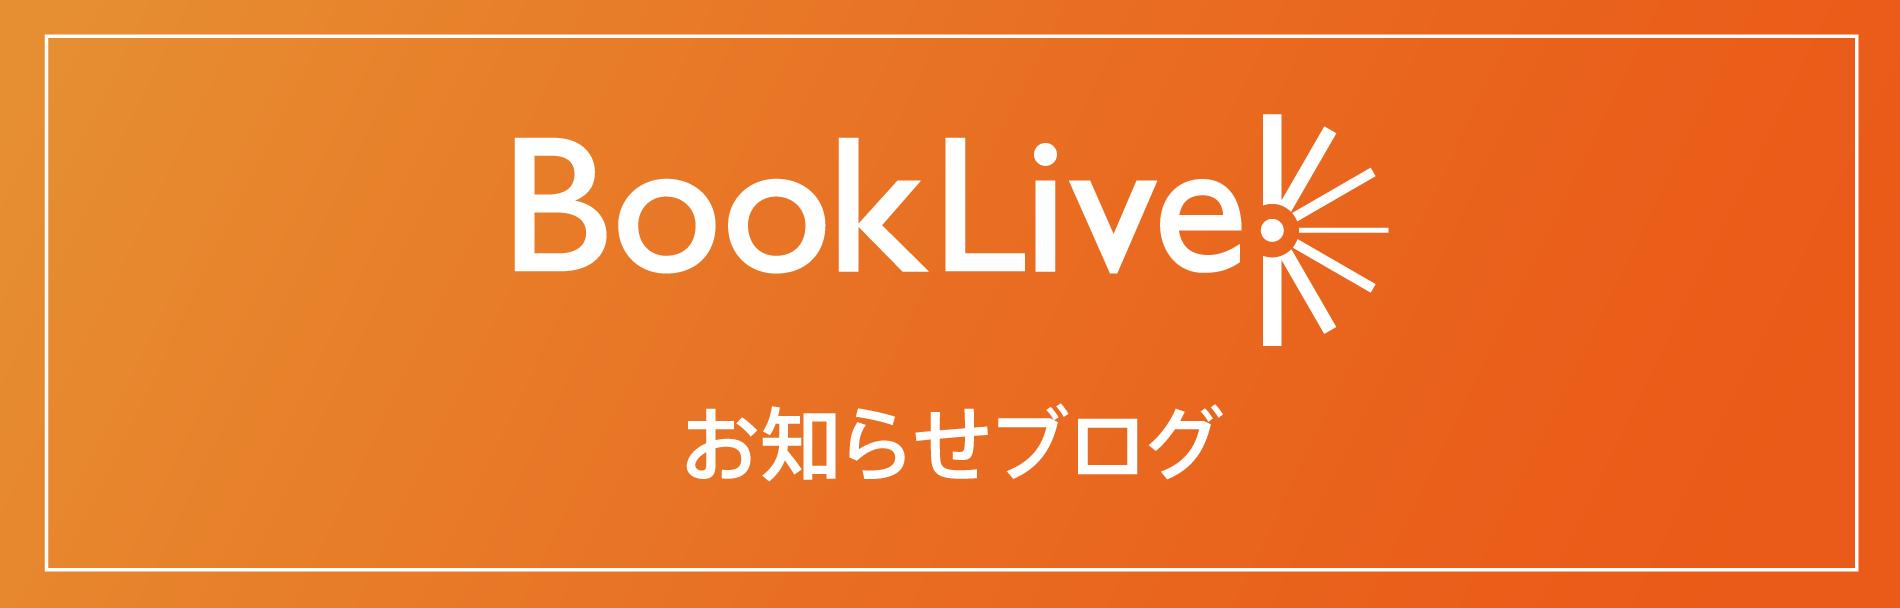 BookLive!お知らせブログ